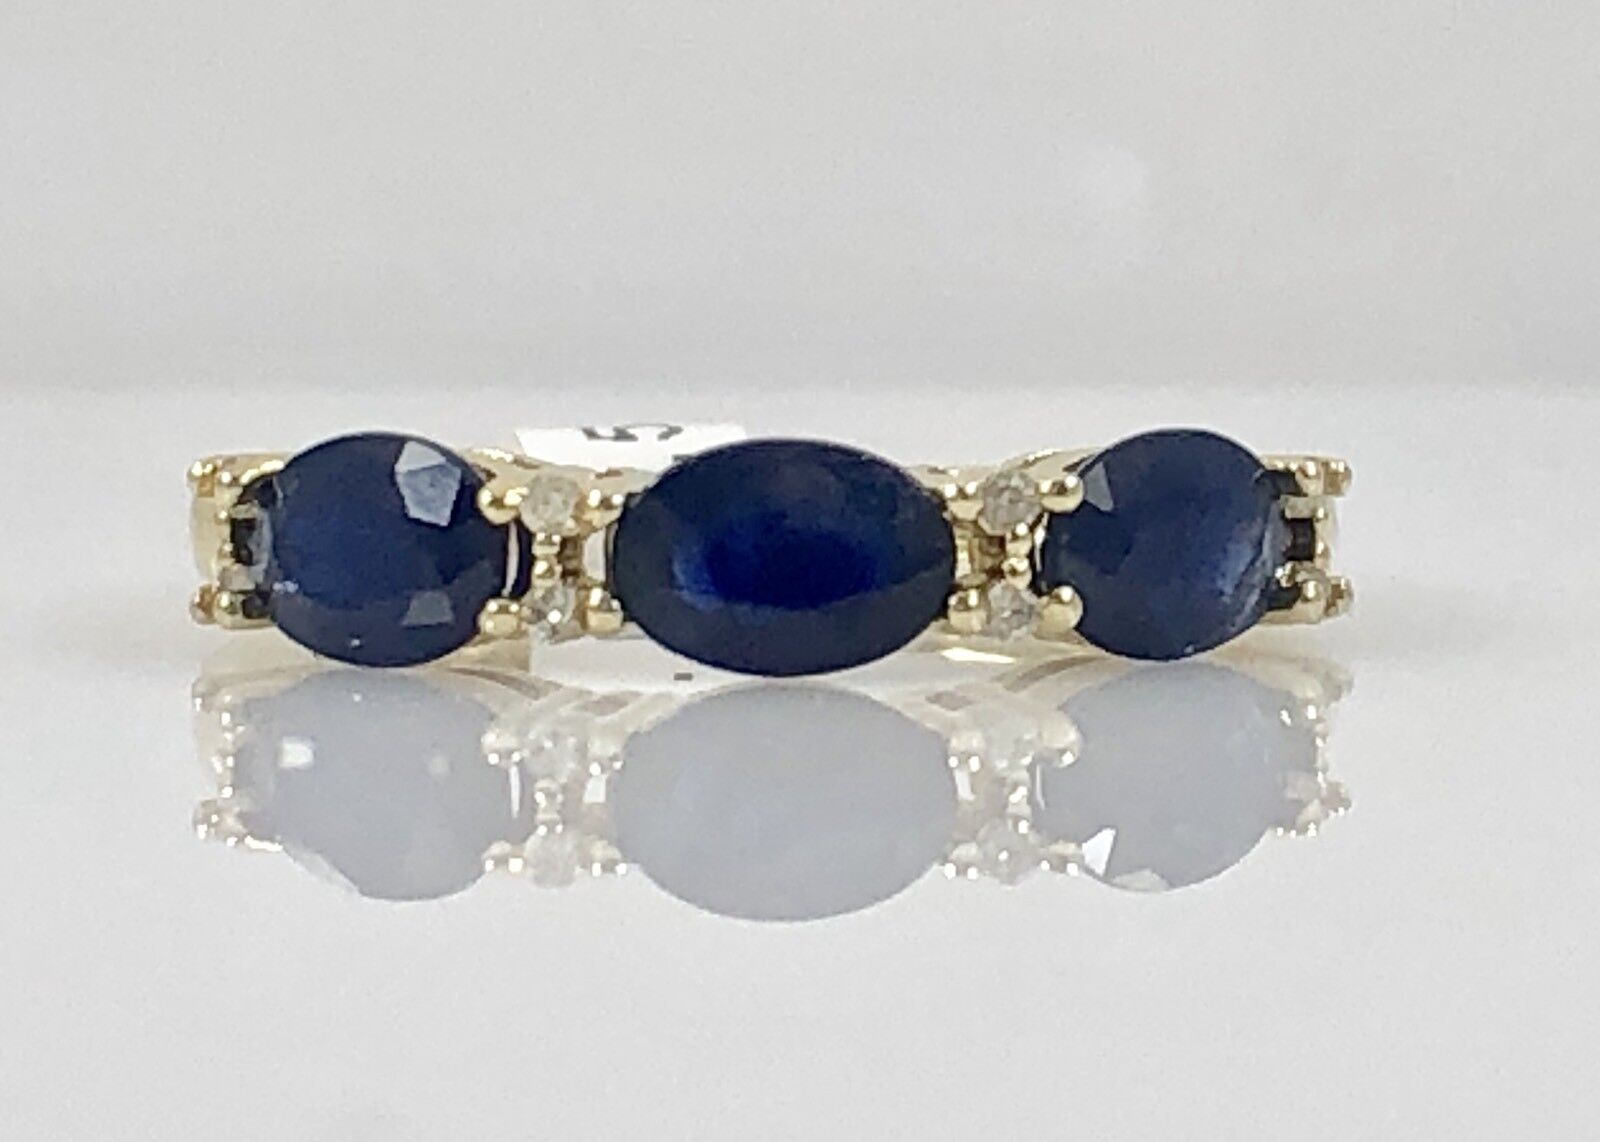 Elegant Genuine Sapphire (1.5ct) & Diamond Solid 10kt Yellow gold Ring, Size 7